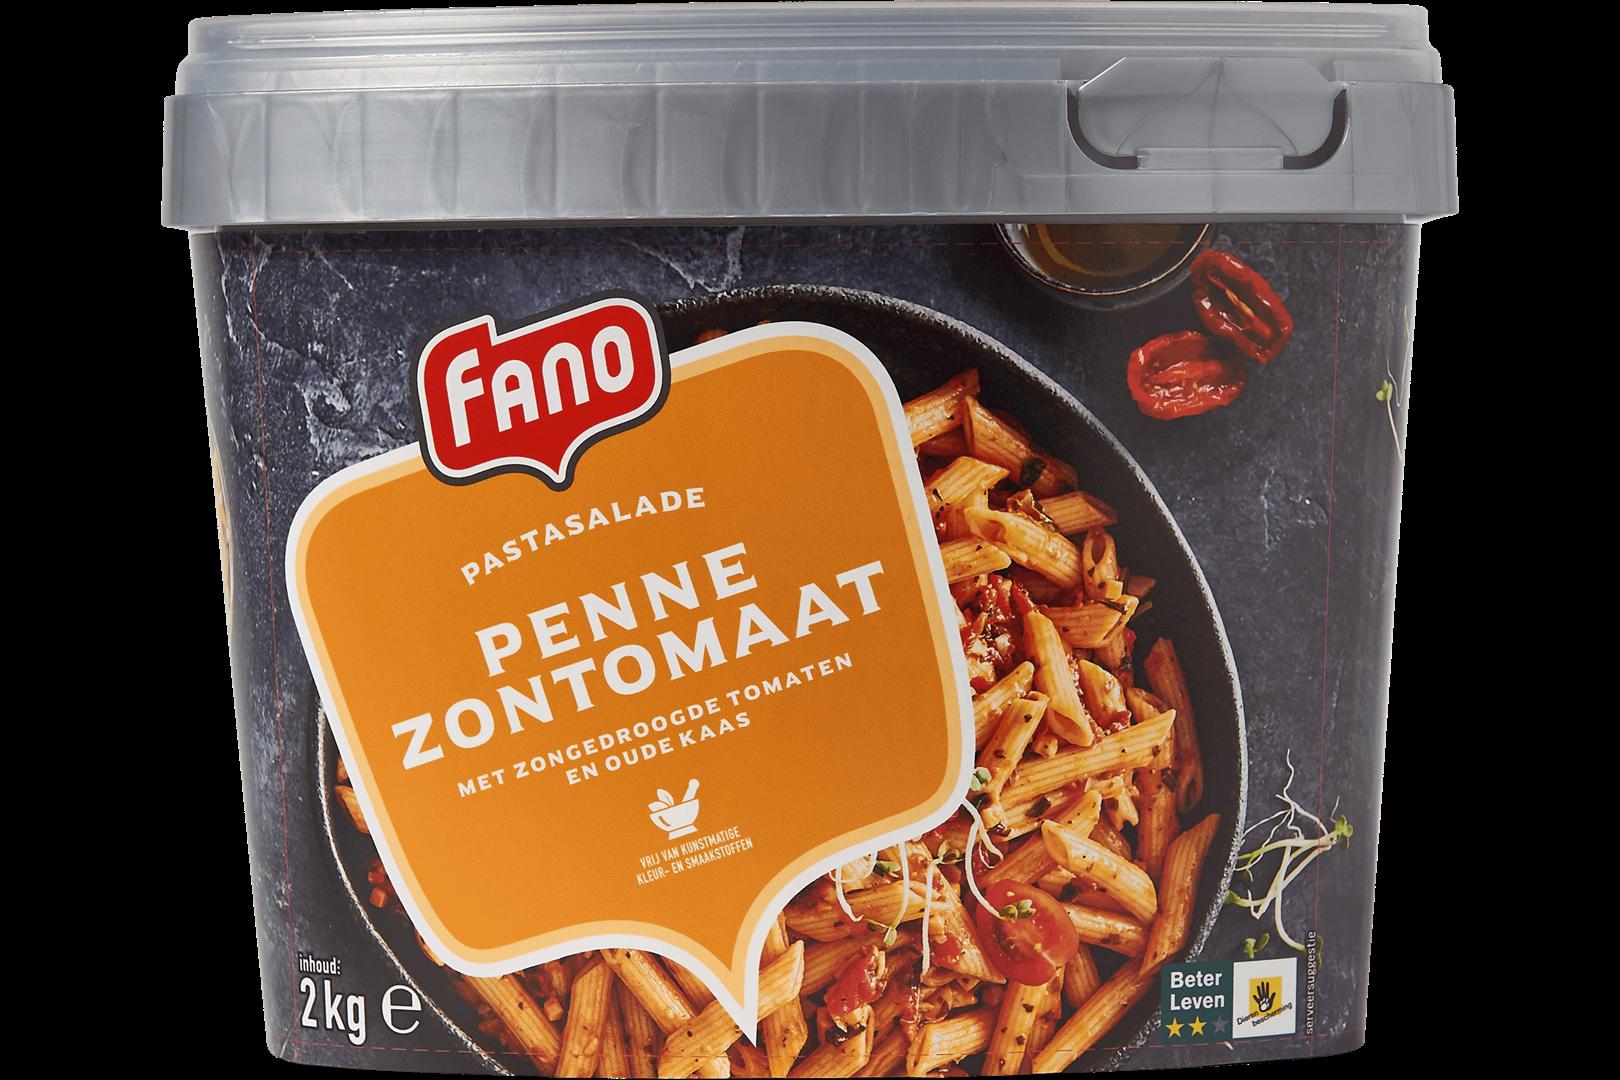 Productafbeelding FANO Pastasalade Zontomaat 2kg